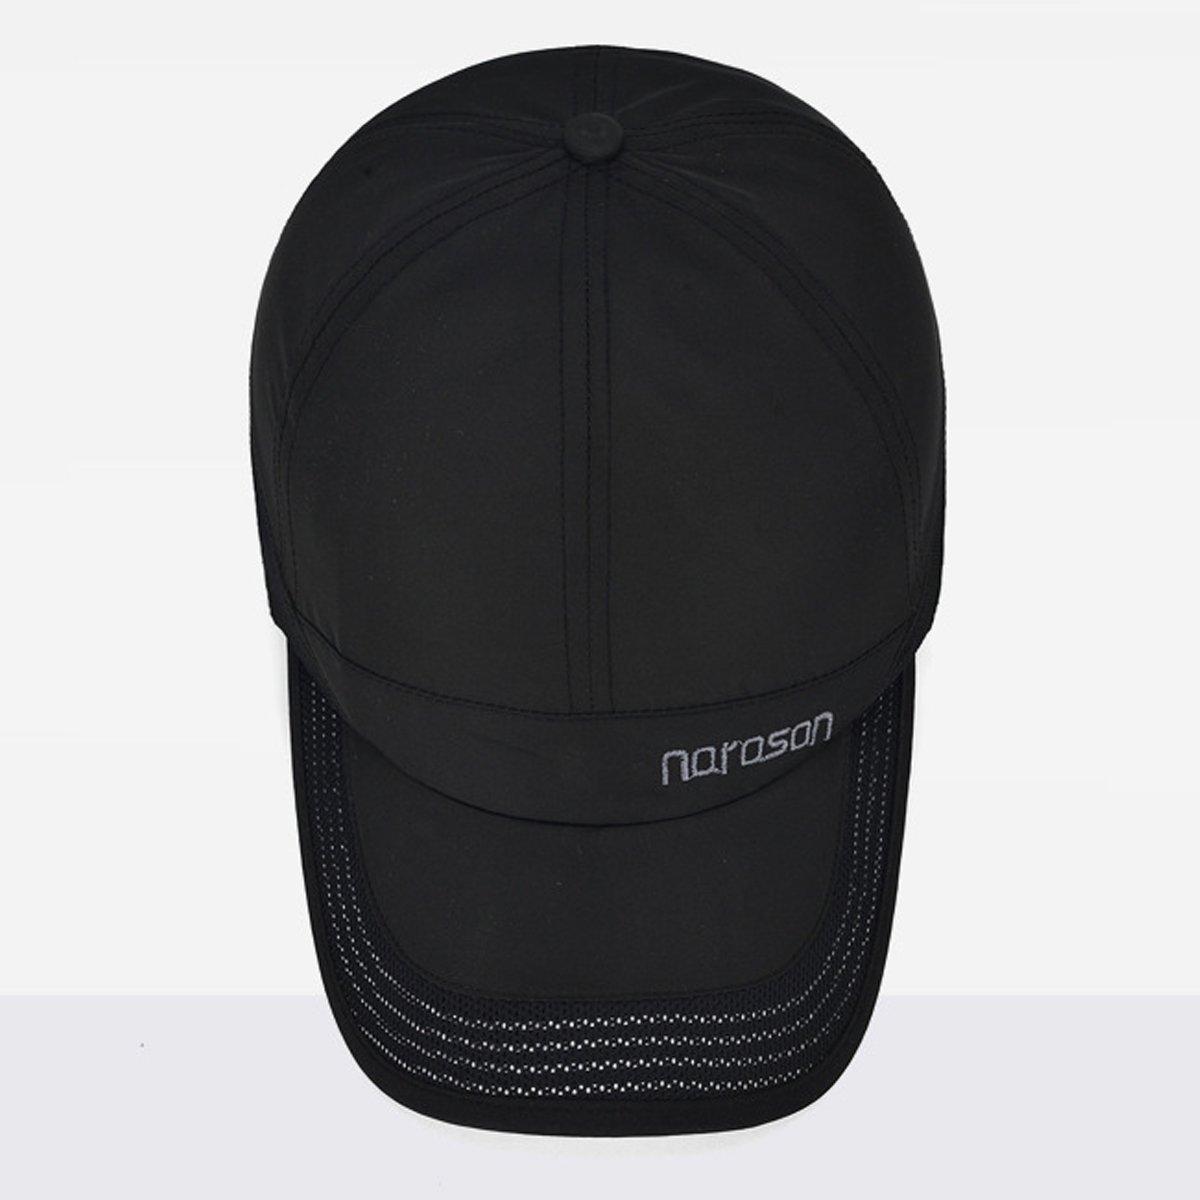 ee8c391c Gisdanchz Hat Quick Dry,Mesh Hat for Men,UV Protection Breathable Outdoor  Hats for Men Baseball cap Running Fishing Hiking Sport ...